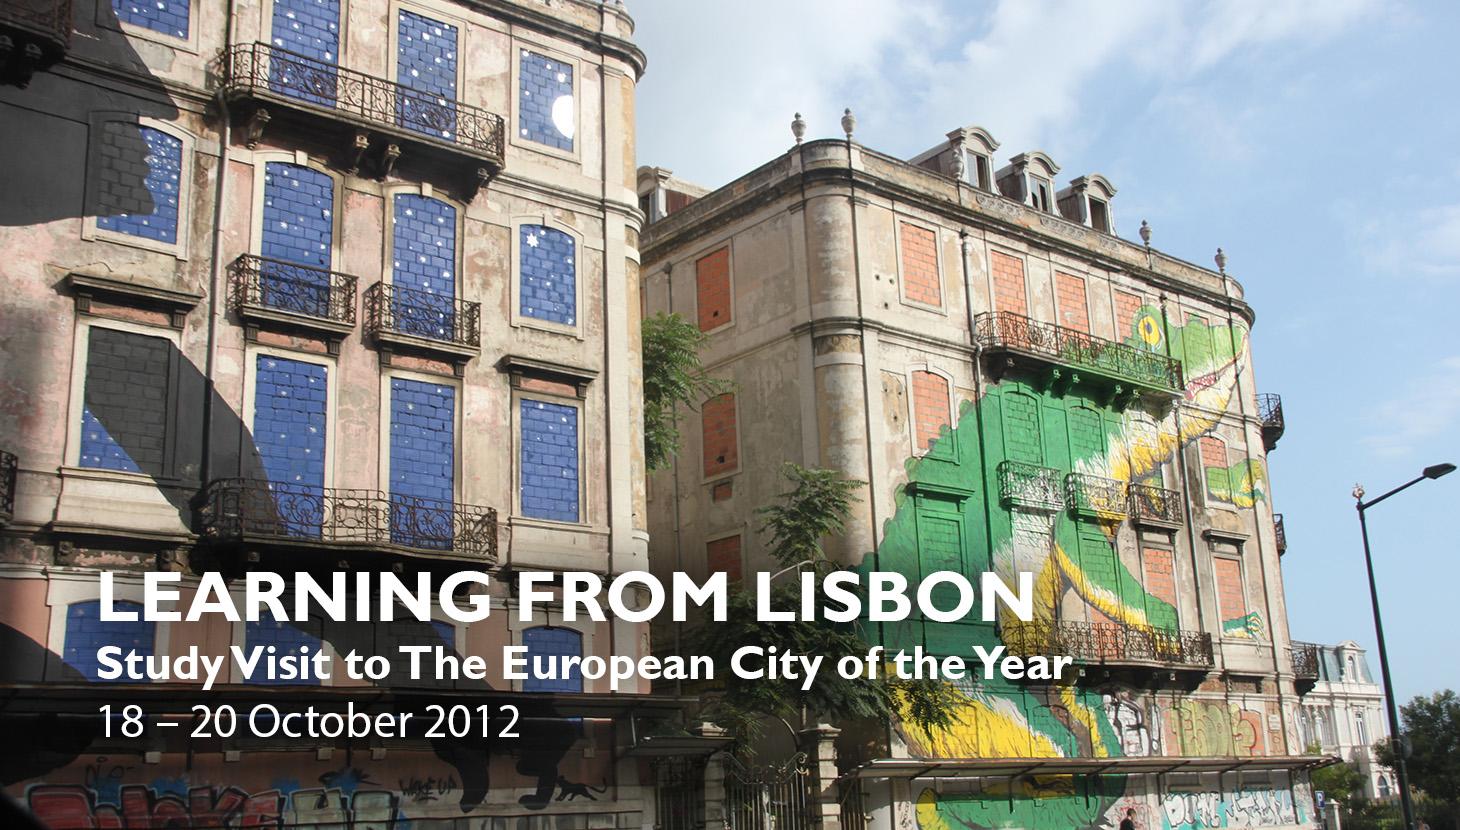 Lisbonfrontpage